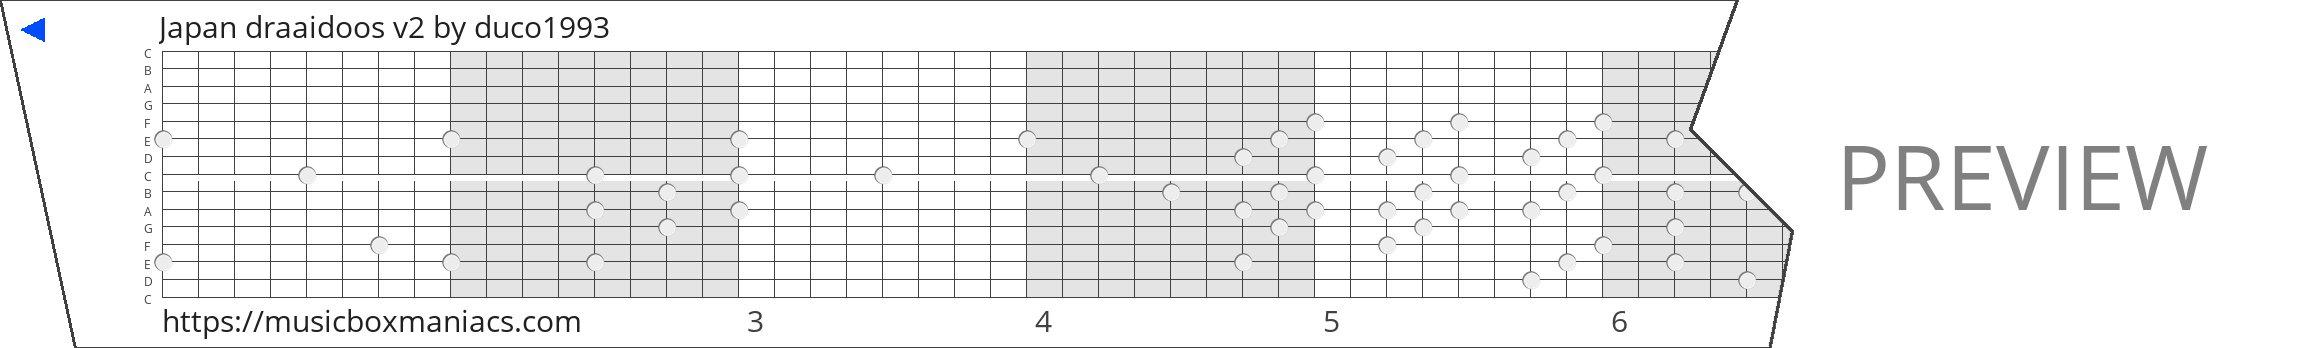 Japan draaidoos v2 15 note music box paper strip